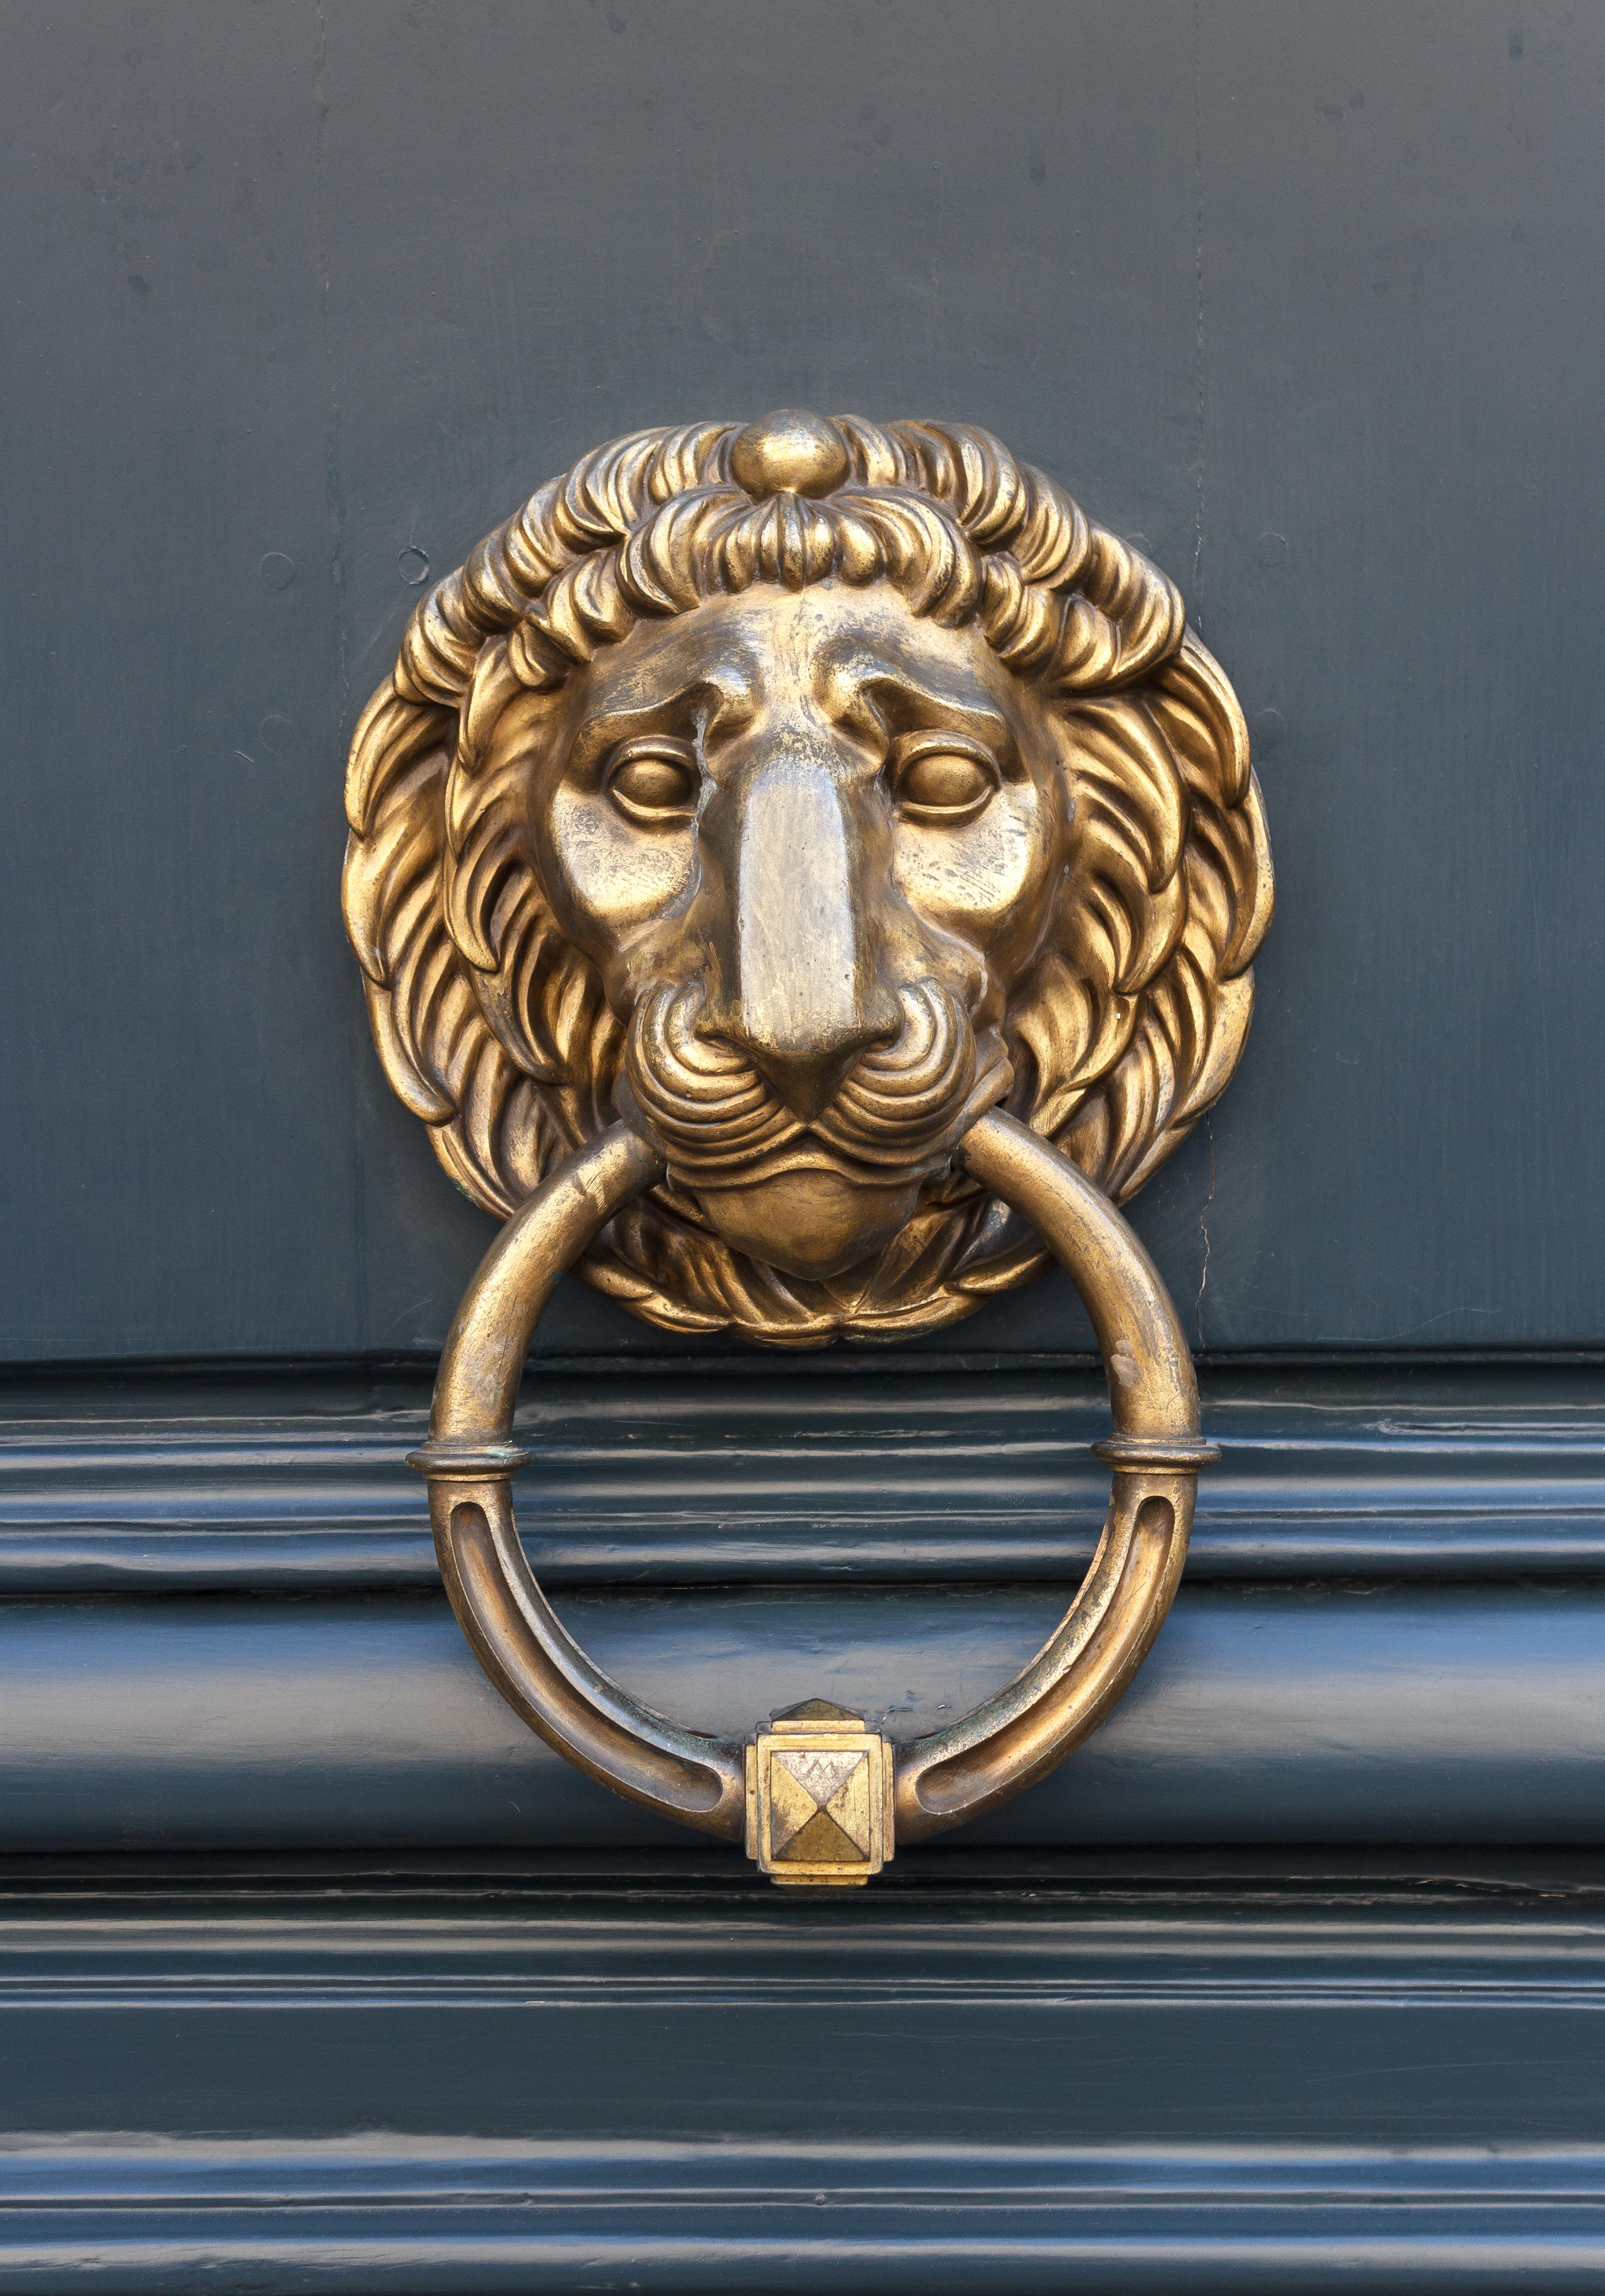 File:Lion Head Brass Door Knocker Central Paris 2012 06 01